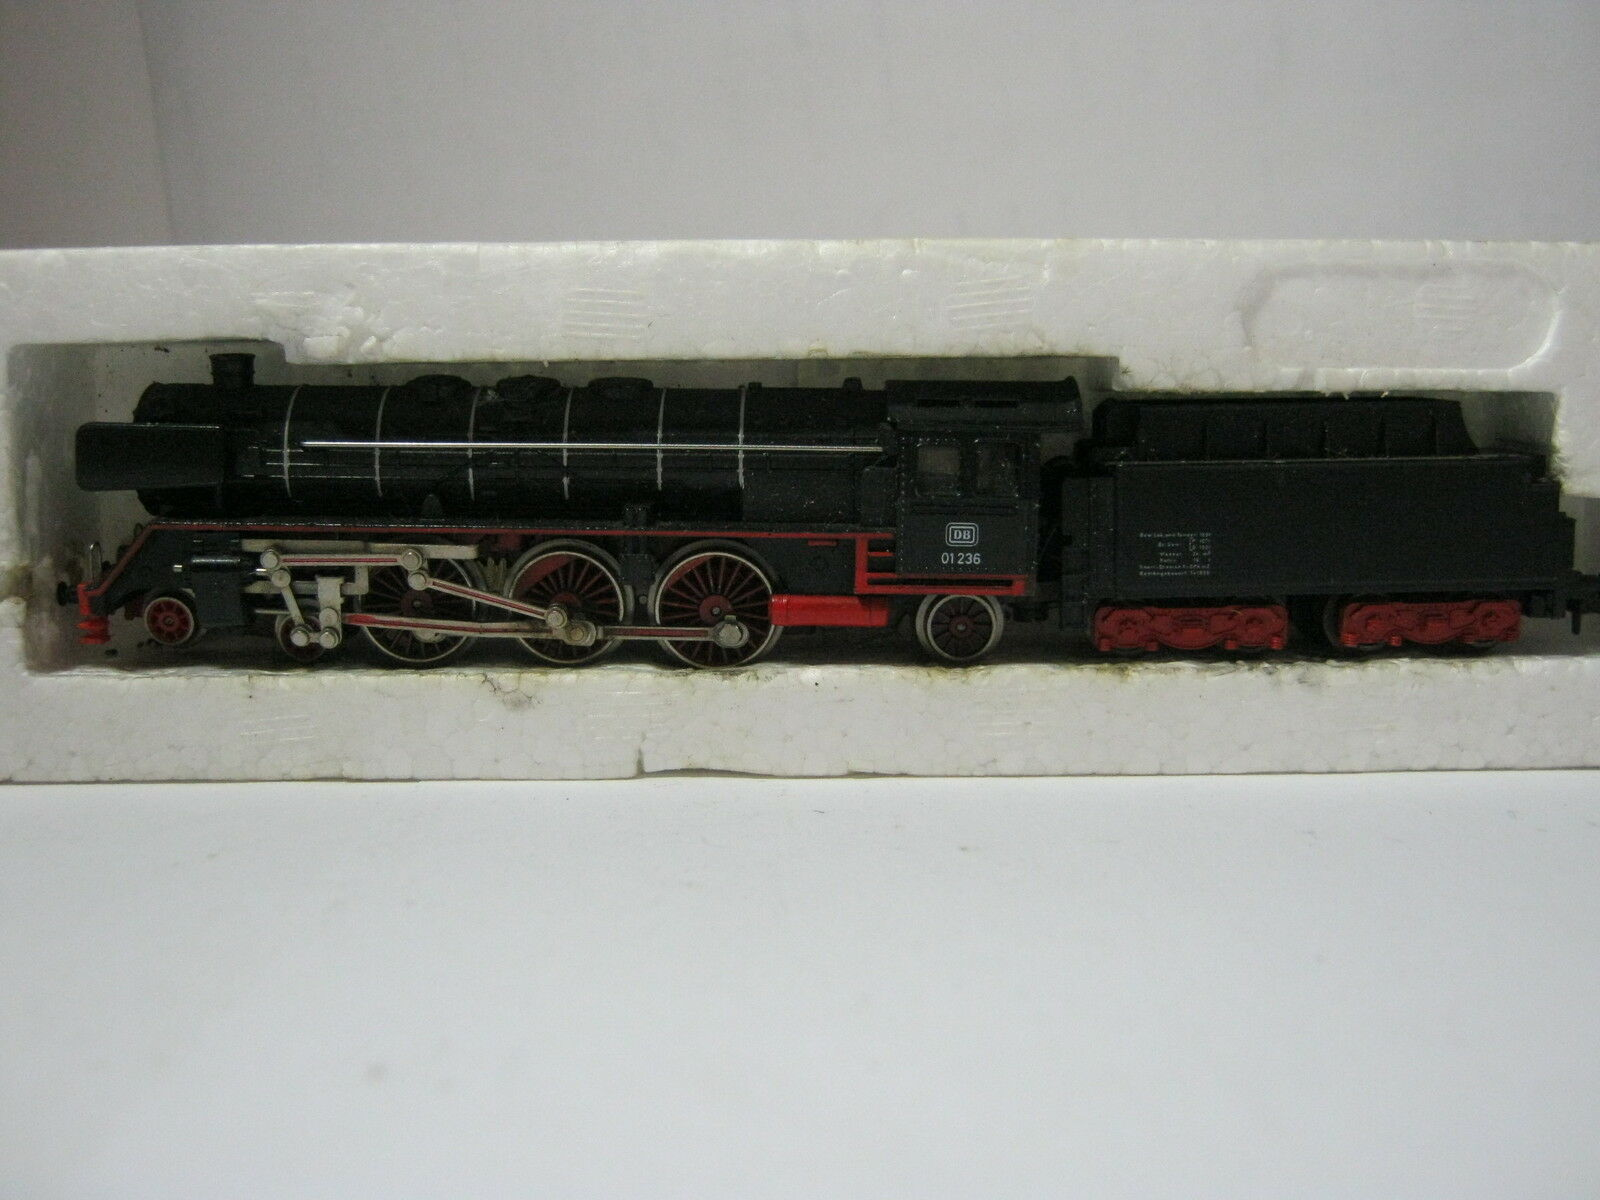 Minitrix N 2900 locomotiva a vapore btrnr 01 236 DB  rg/aw/50s5